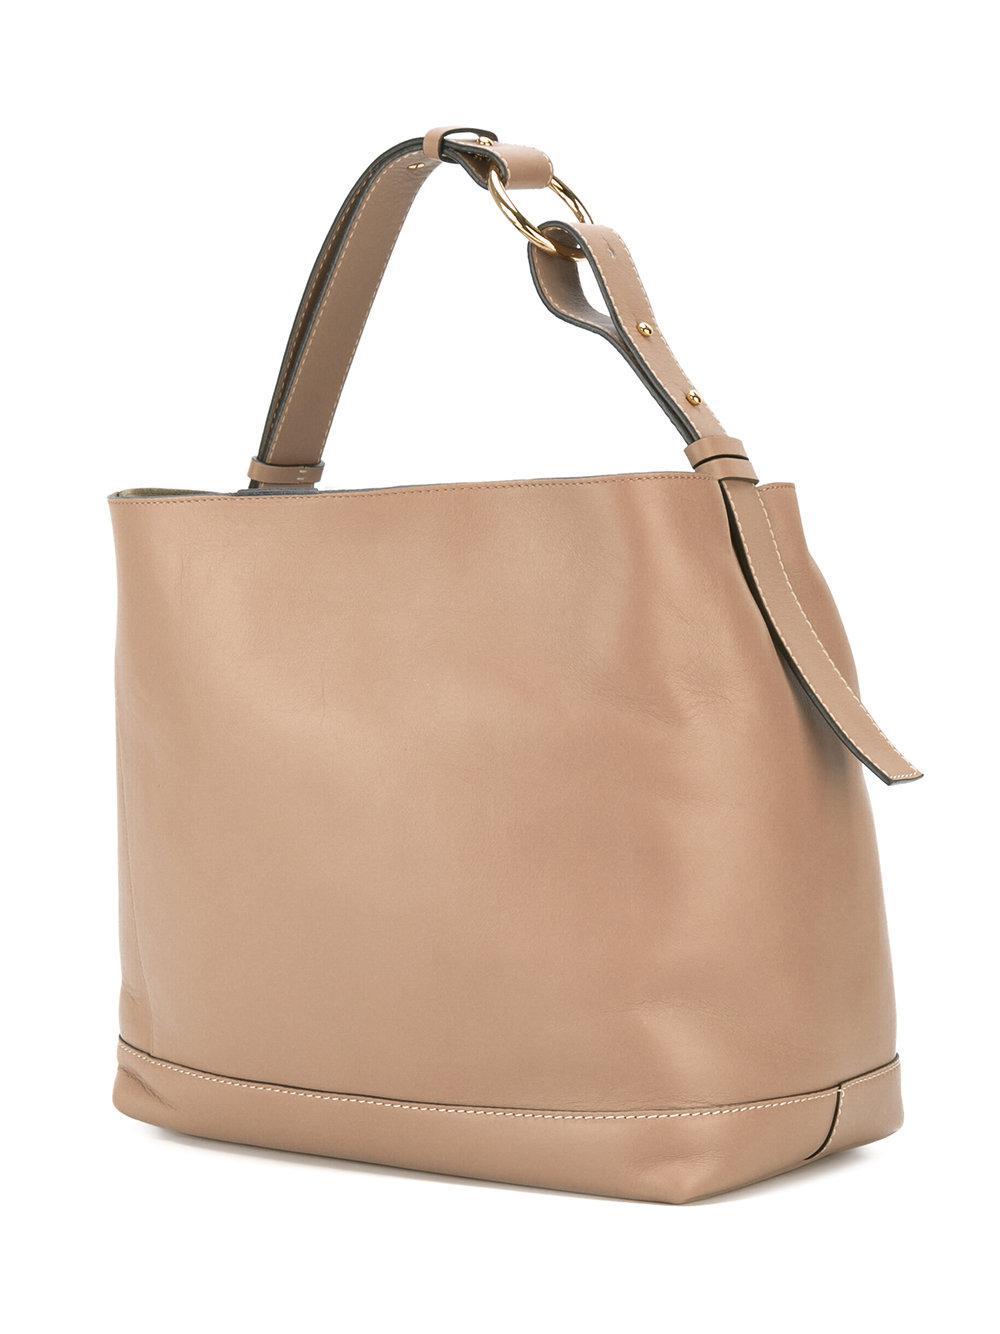 Marni Leather Halo Pod Tote Bag in Natural